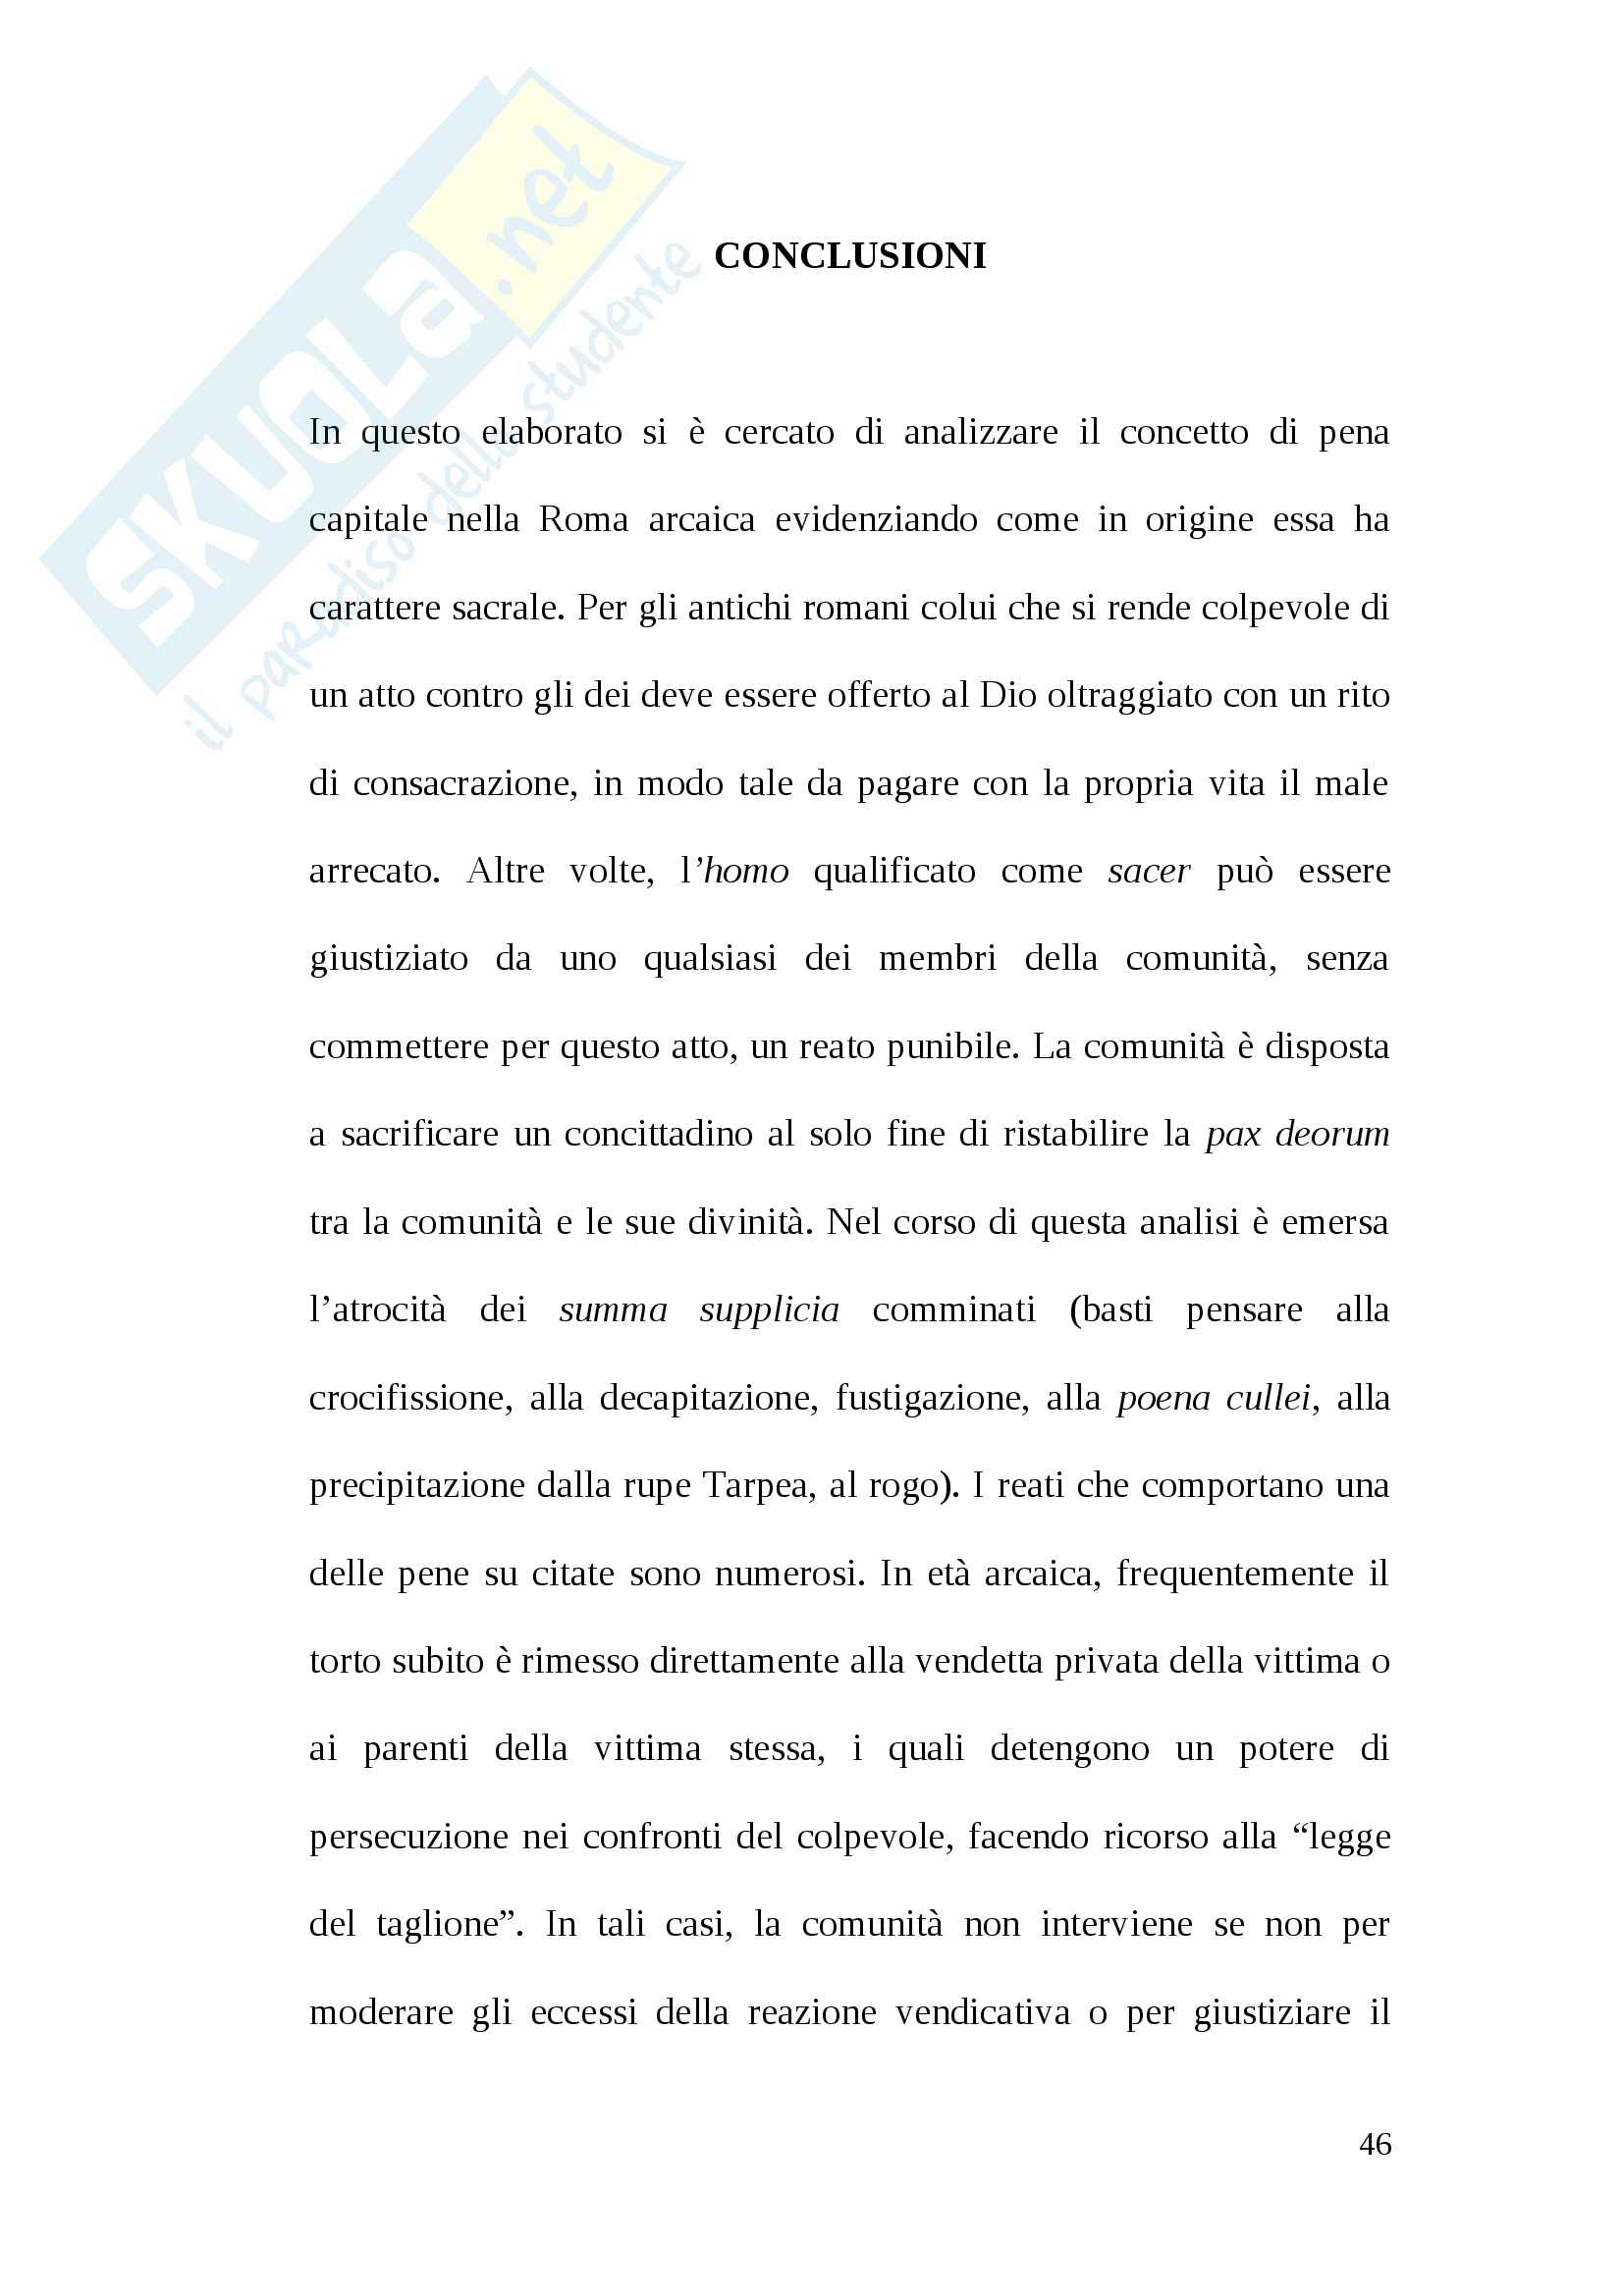 Tesi pena di morte antica Roma Pag. 46